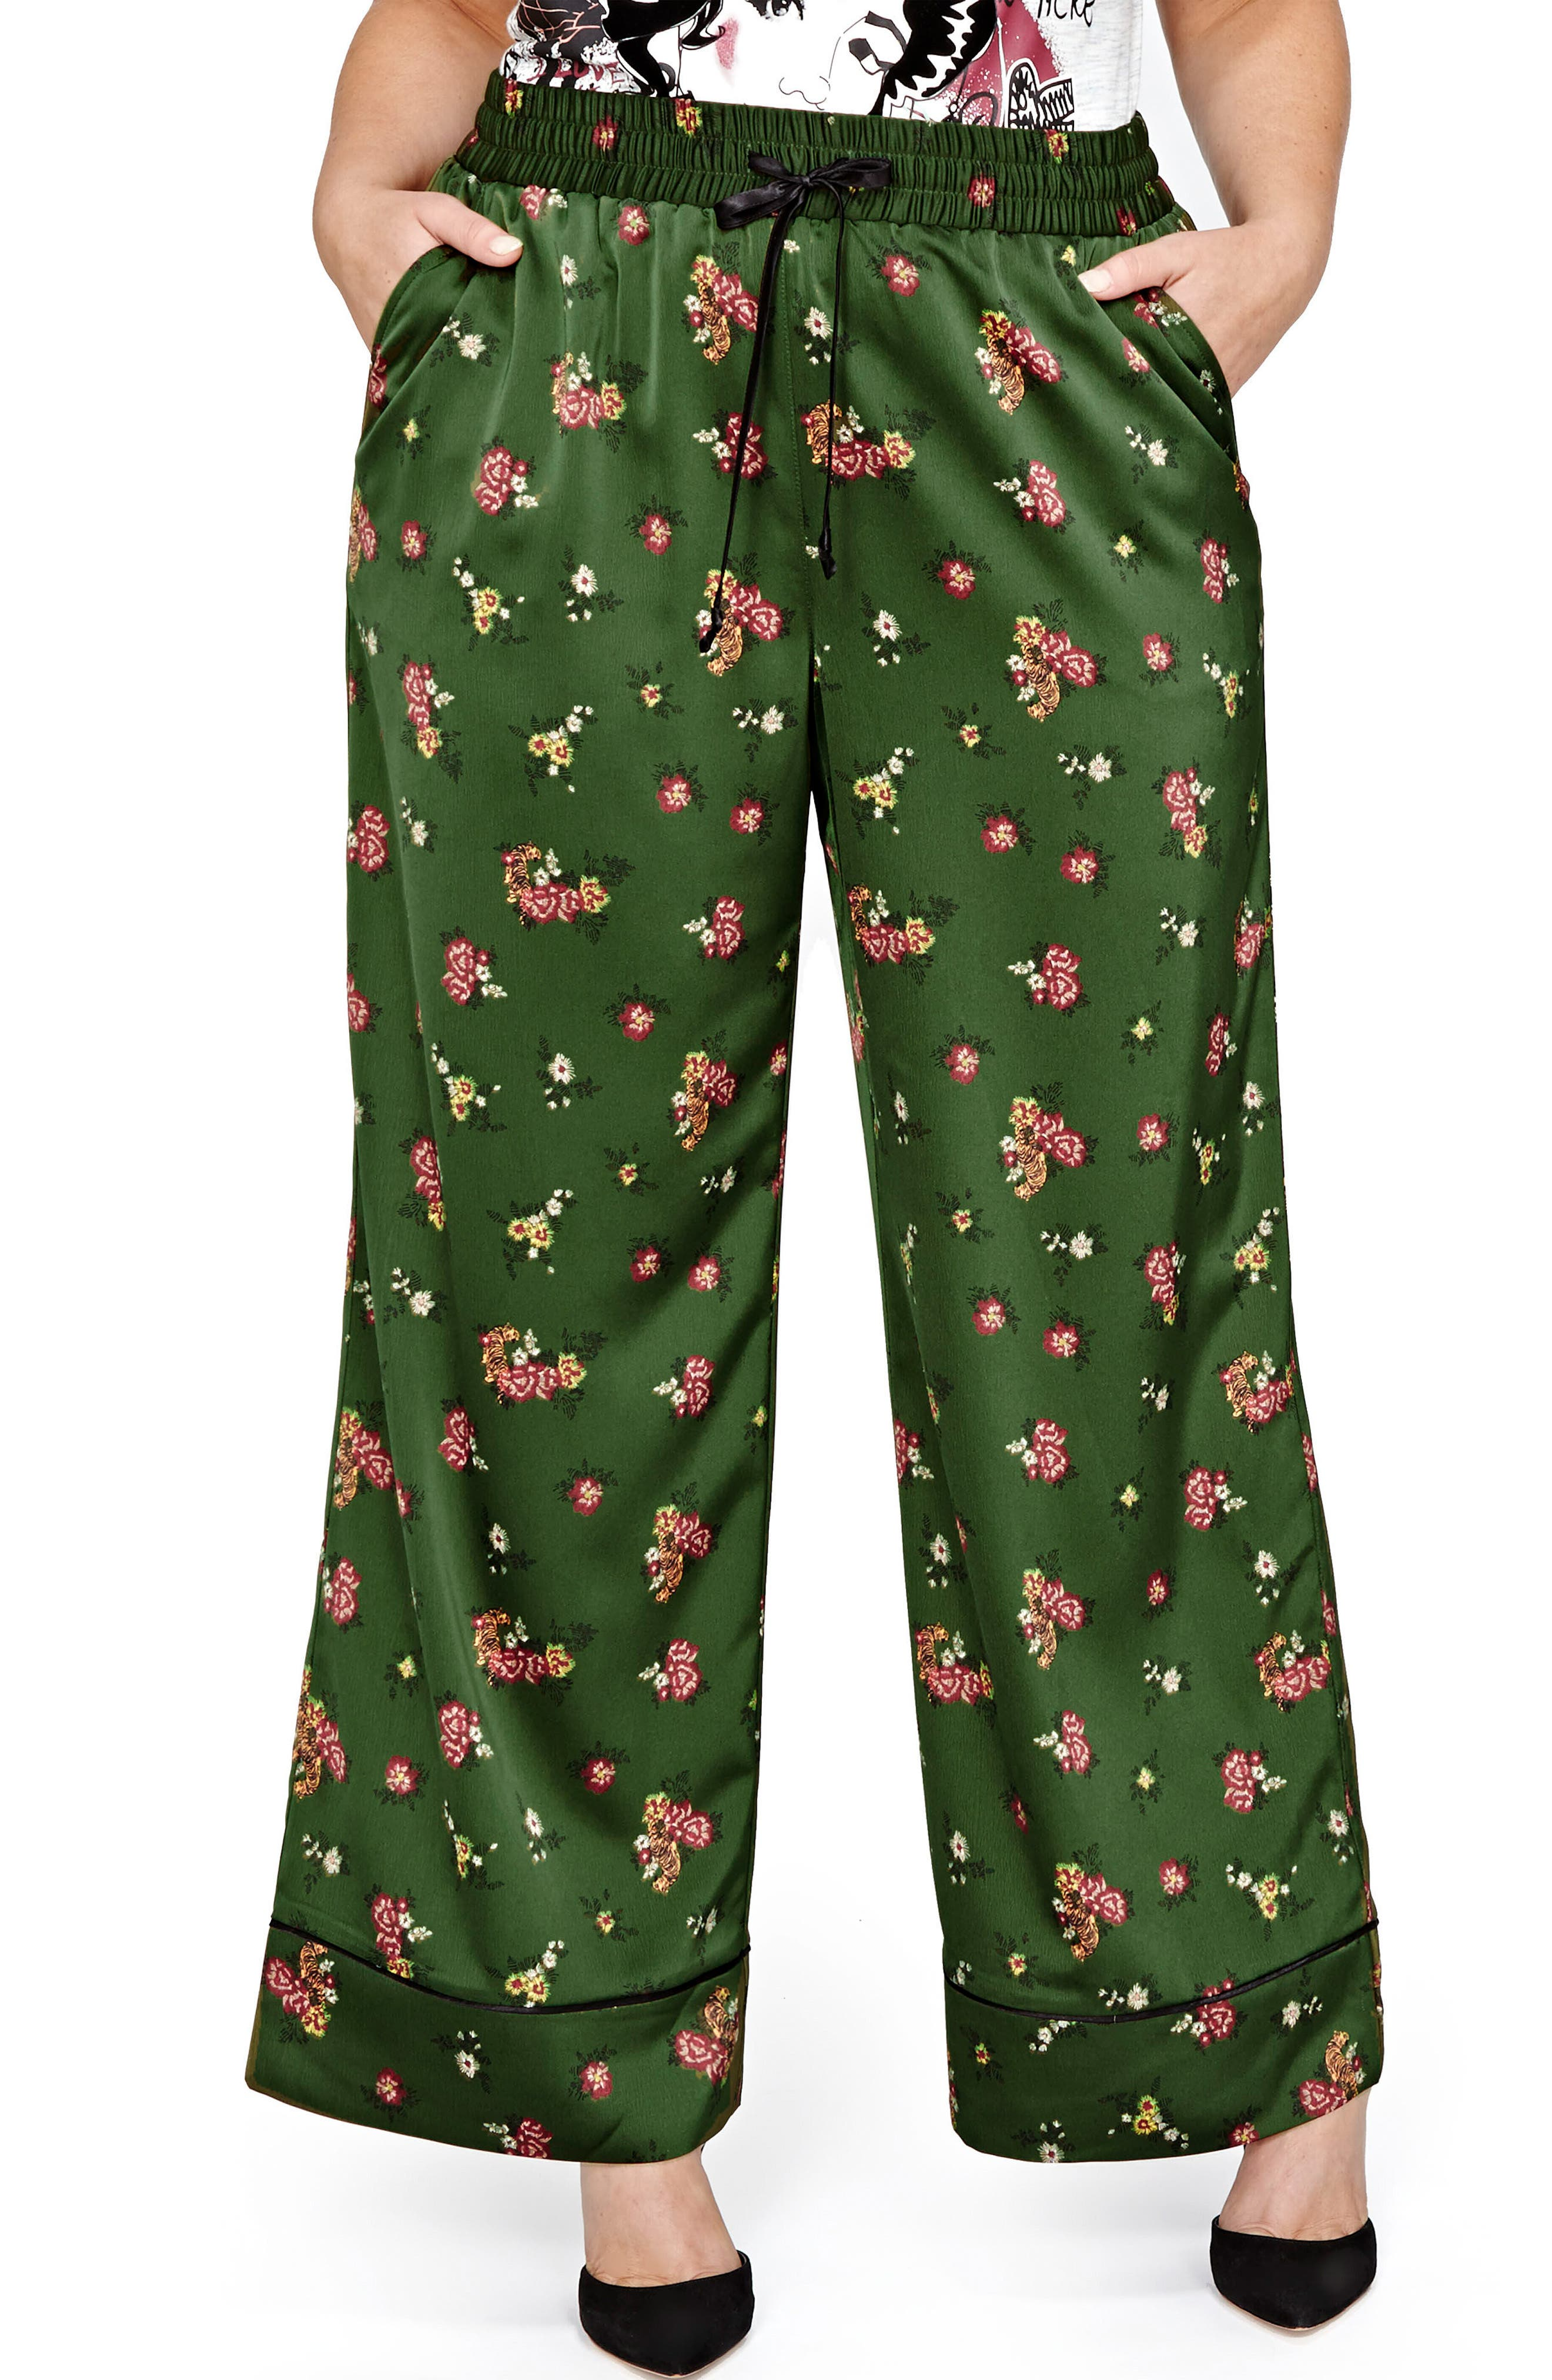 Alternate Image 1 Selected - ADDITION ELLE LOVE AND LEGEND Jordyn Woods Wide-Leg Satin Pants (Plus Size)